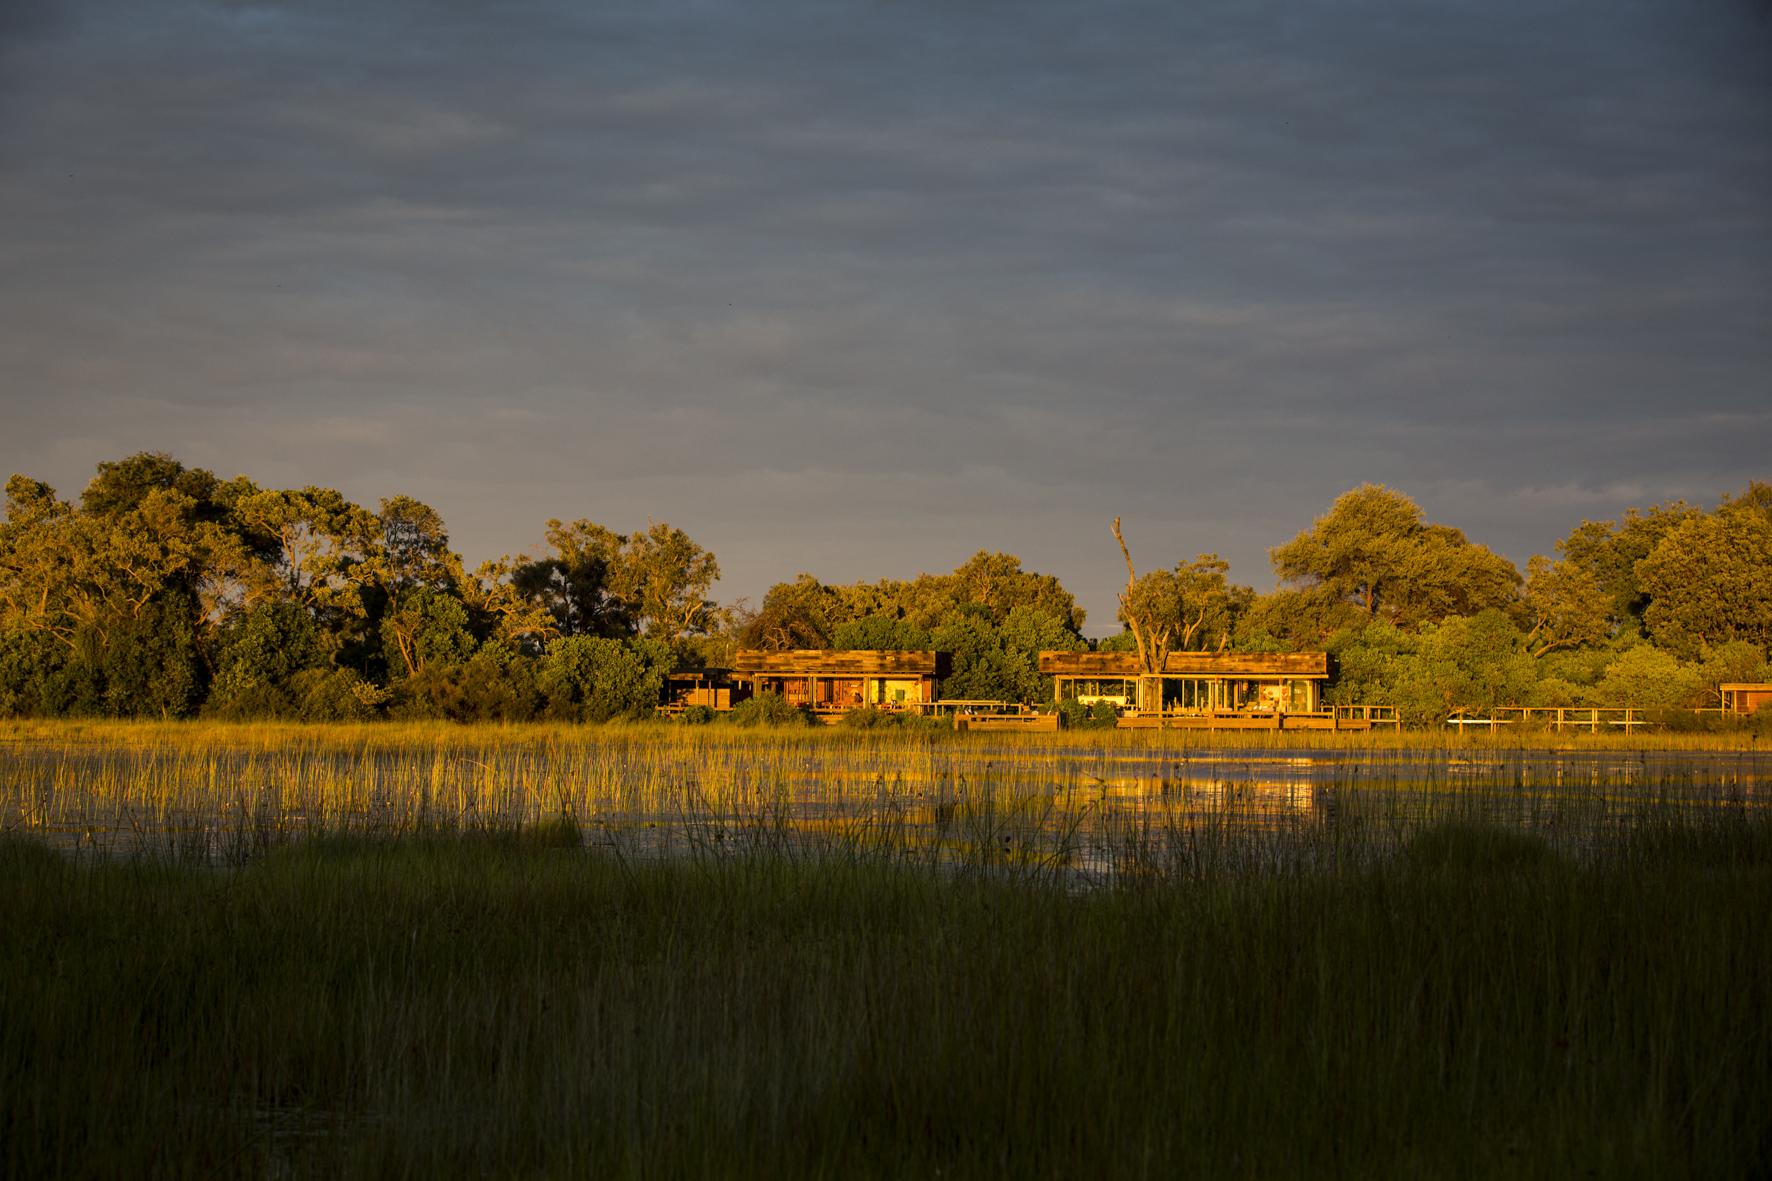 VumburaCamp-Botswana-CrookesAndJackson-7332